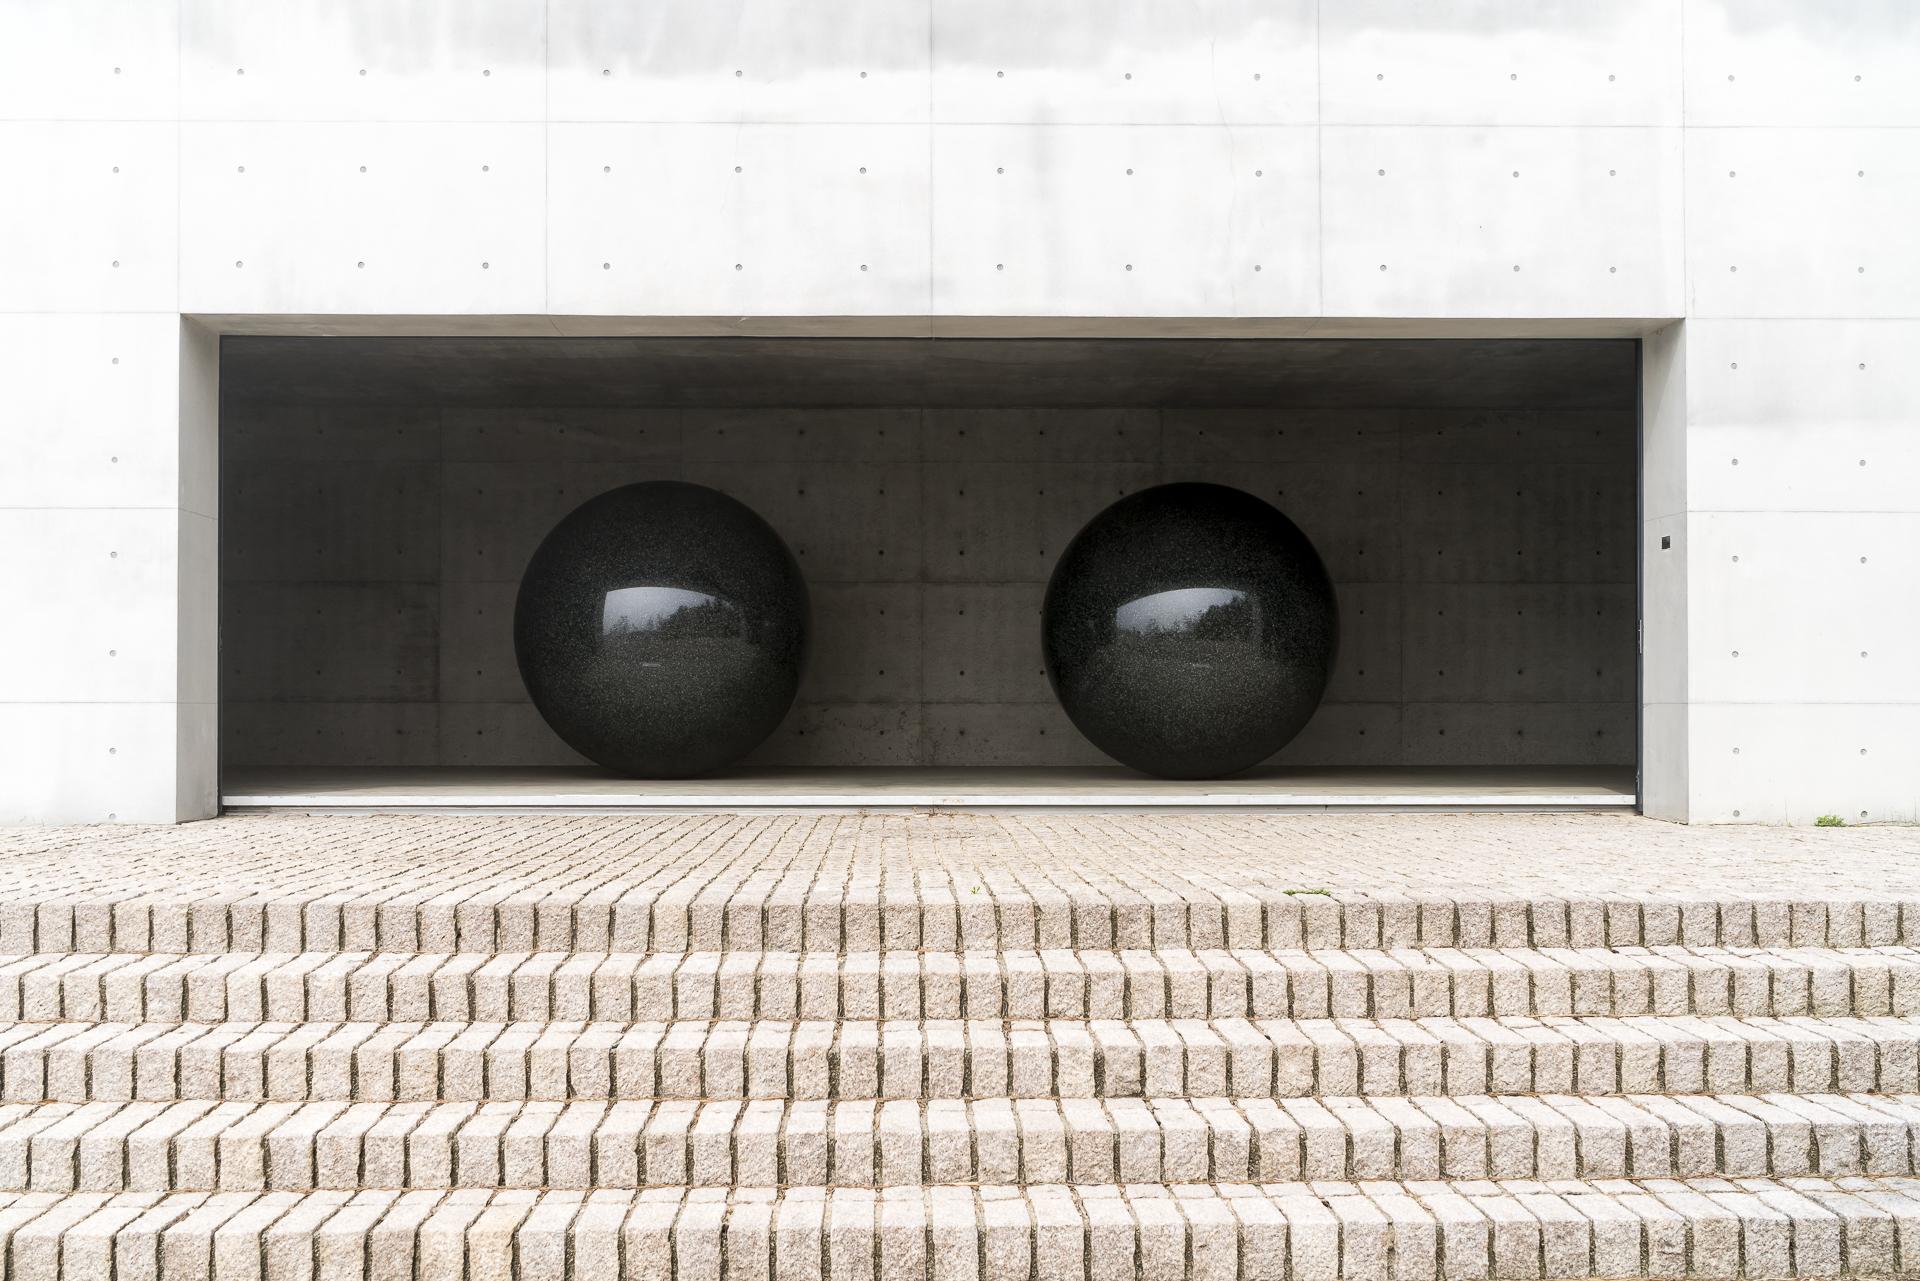 Walter de Maria Tadao Ando Naoshima